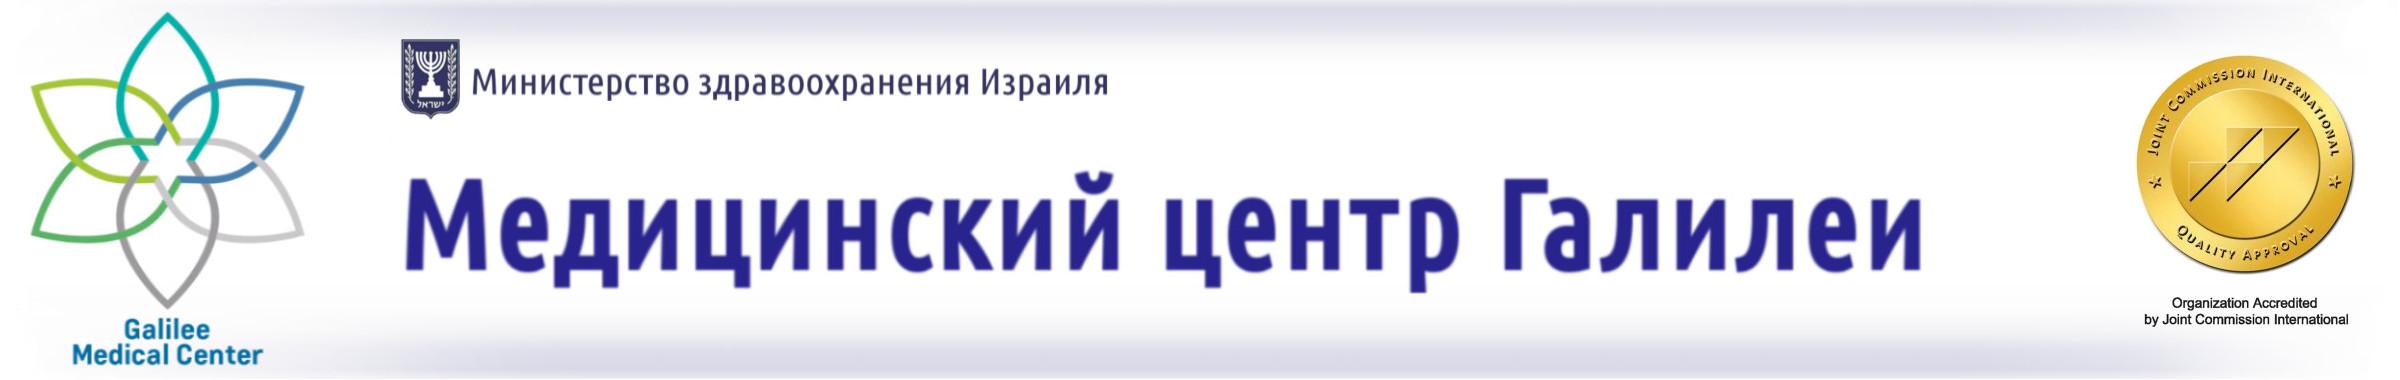 МЕДИЦИНСКИЙ ЦЕНТР ГАЛИЛЕЯ